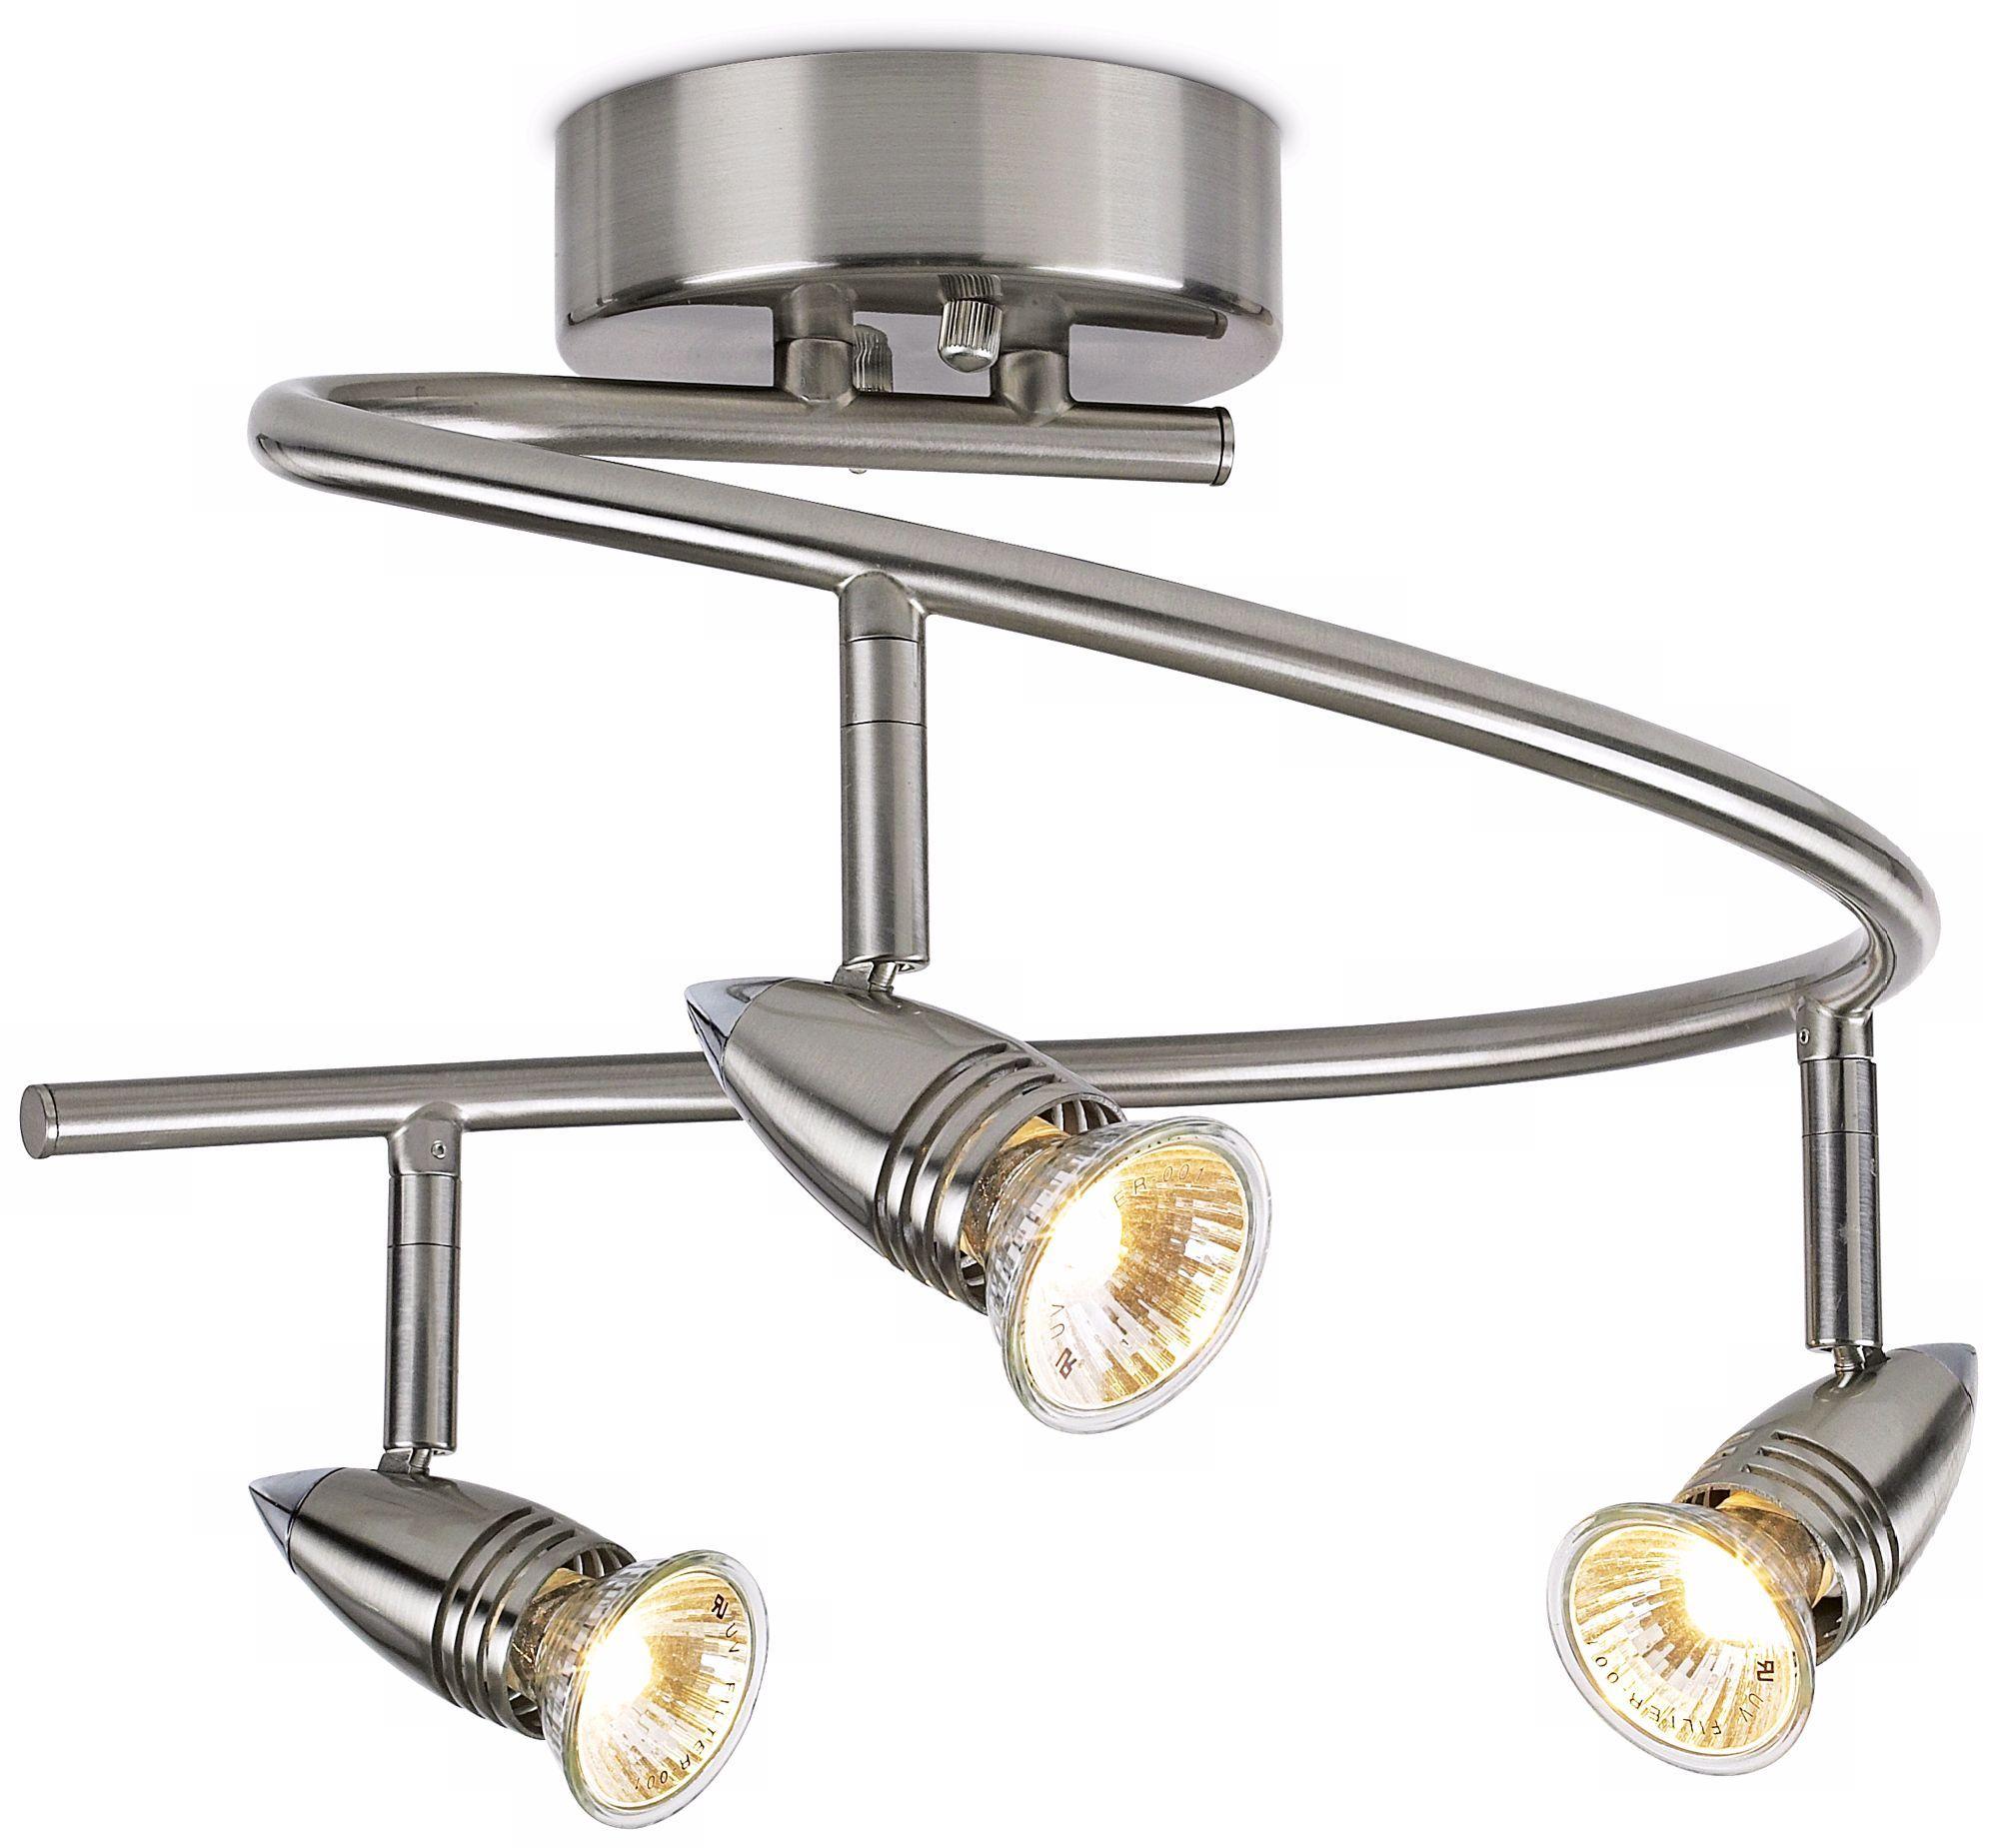 Track Lighting - Lighting - The Home Depot